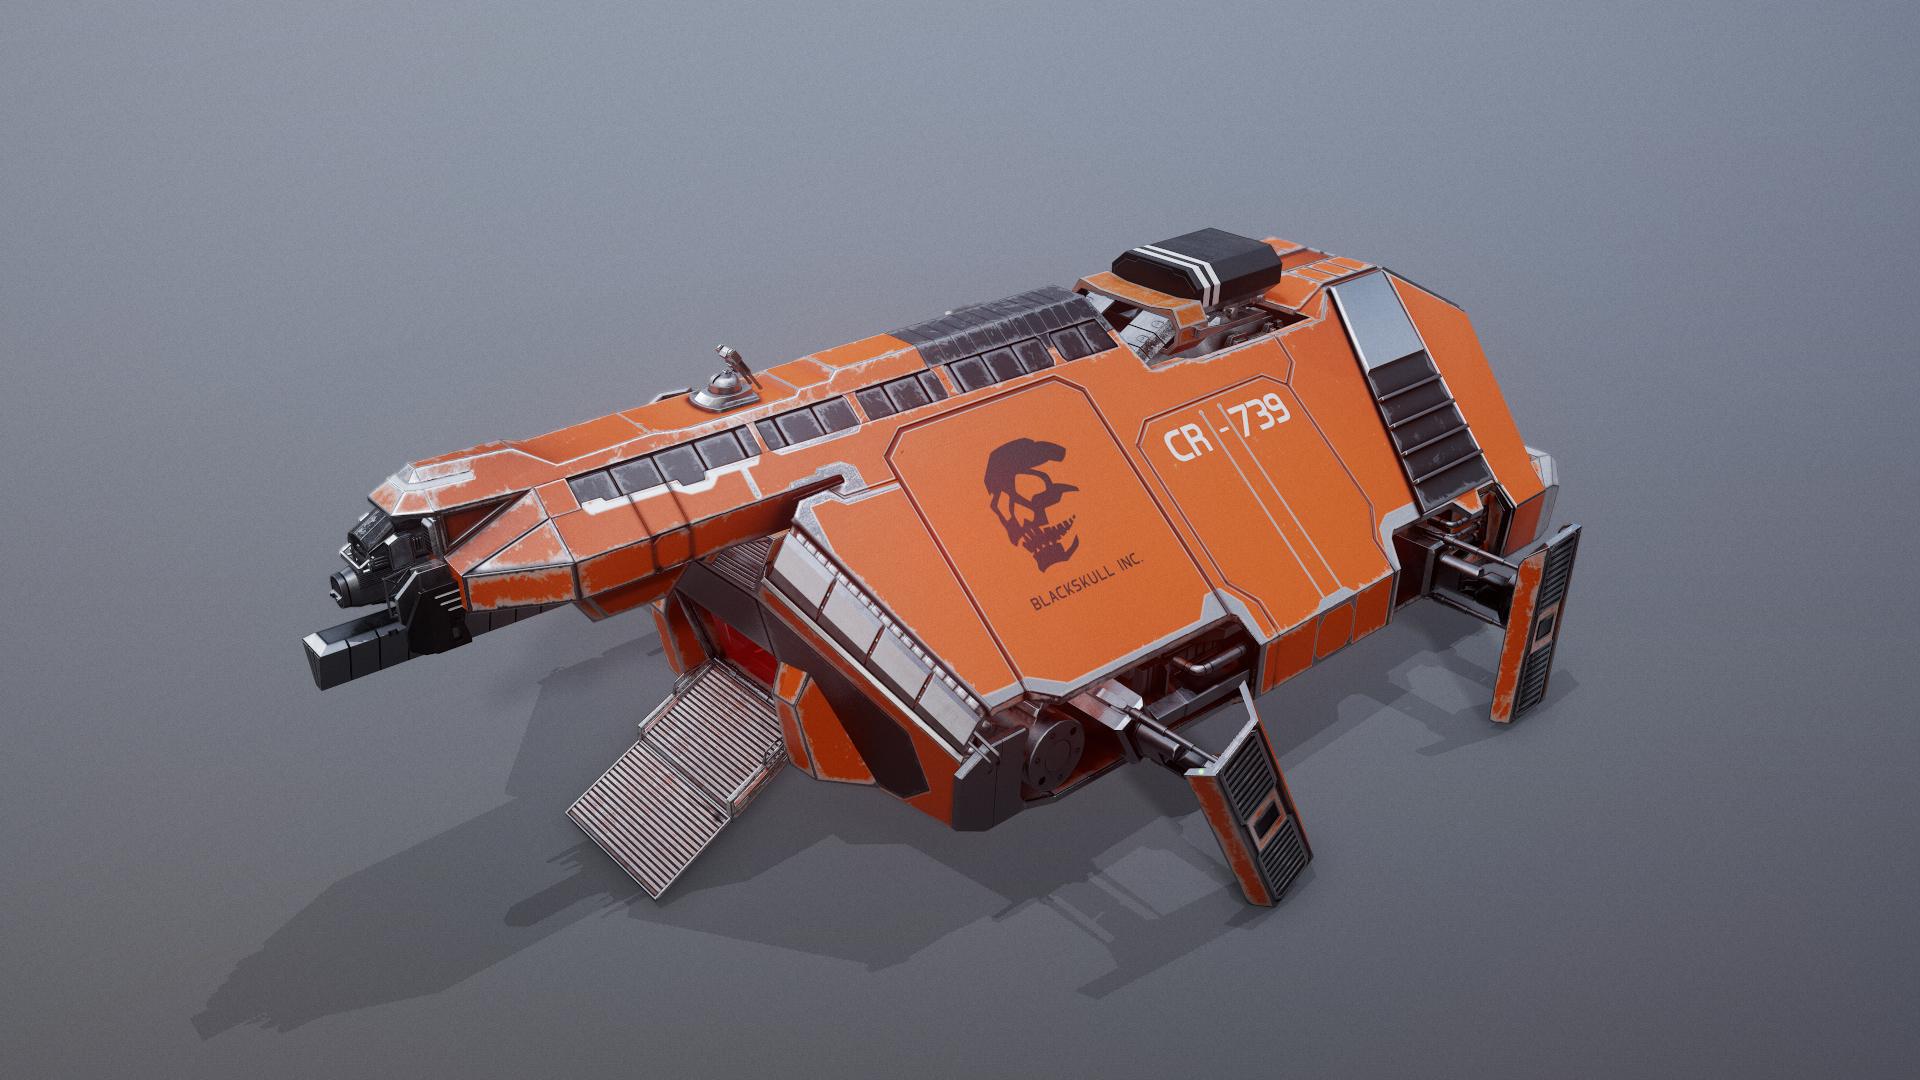 Sci-Fi Cargo Spaceship Animated